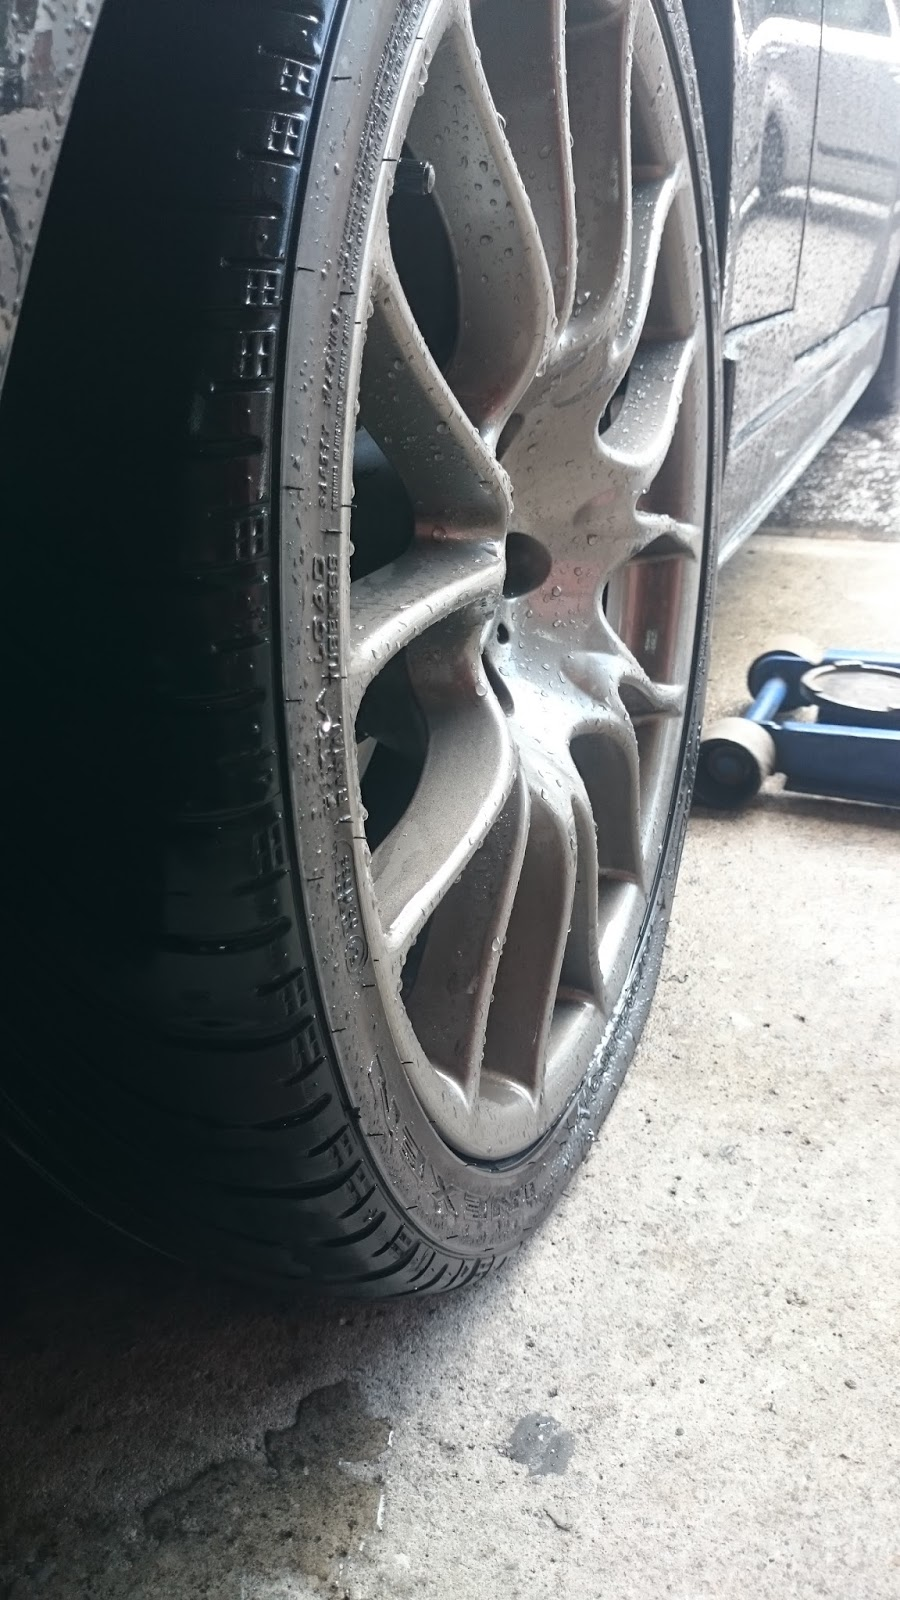 Rim cracked on car